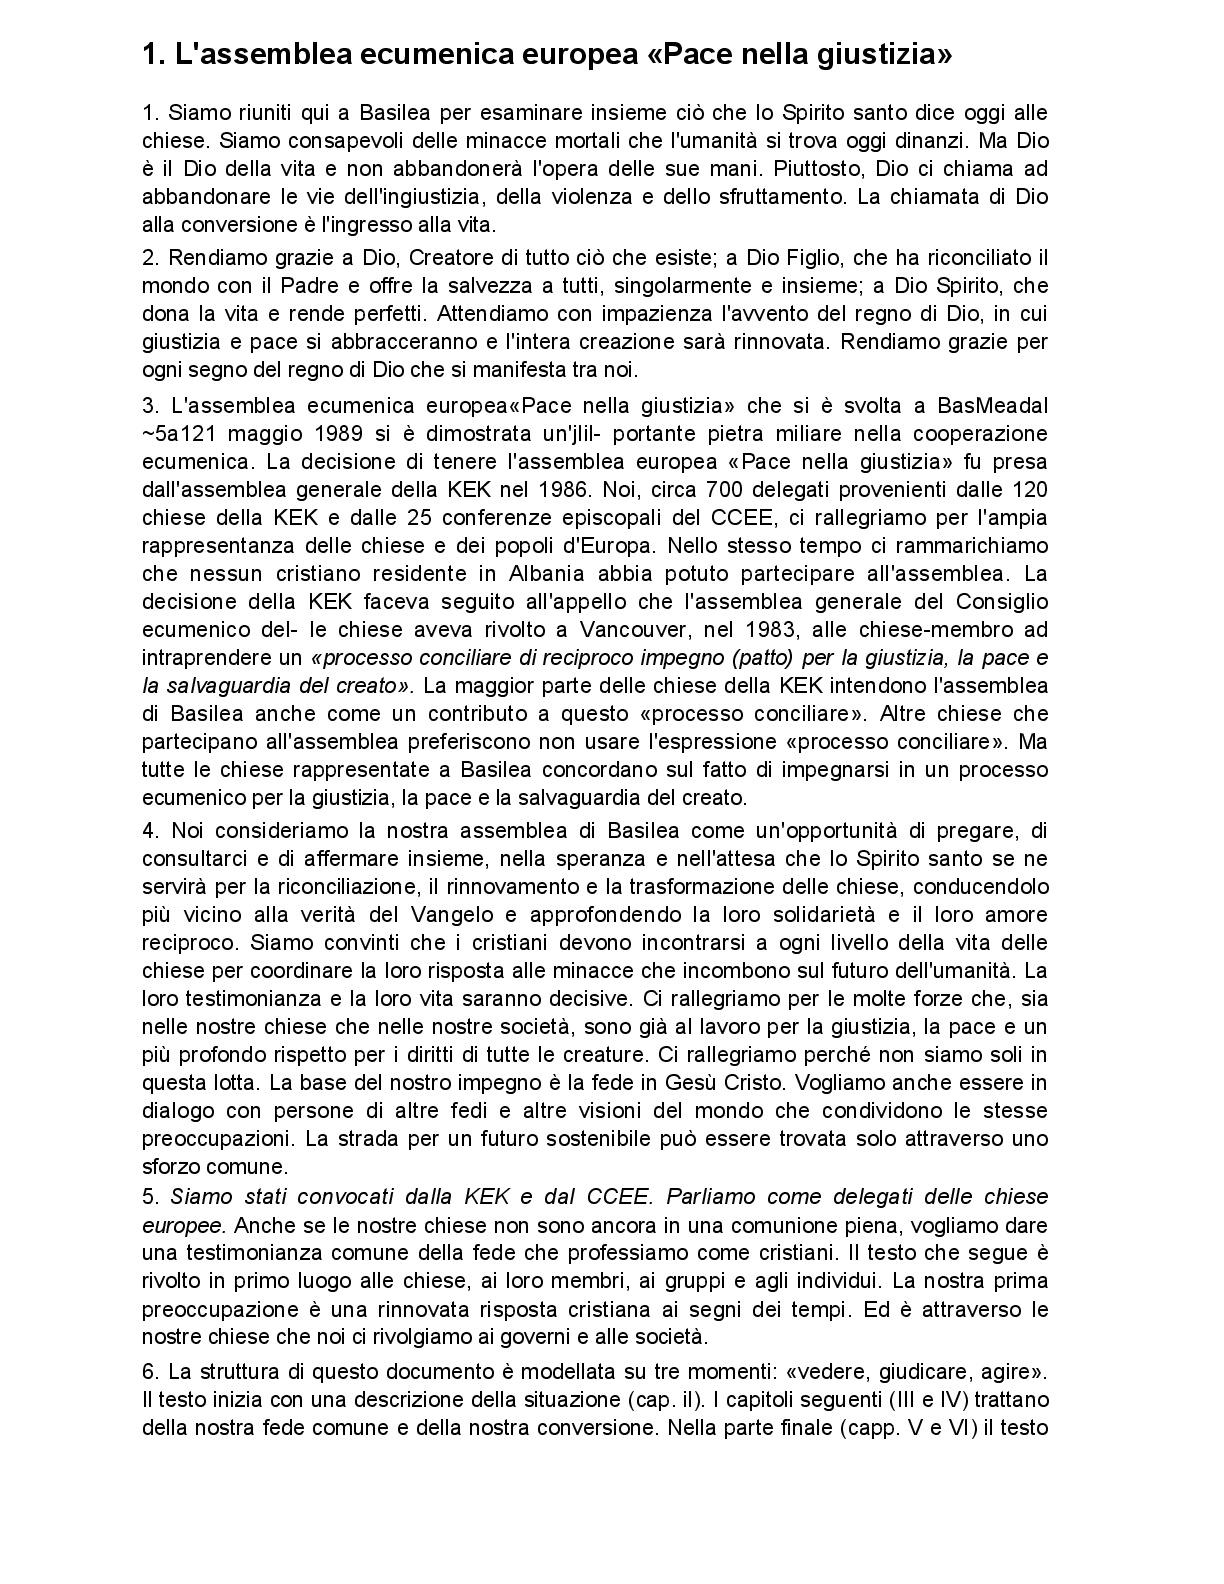 Basilea-003-5ae208a060f33